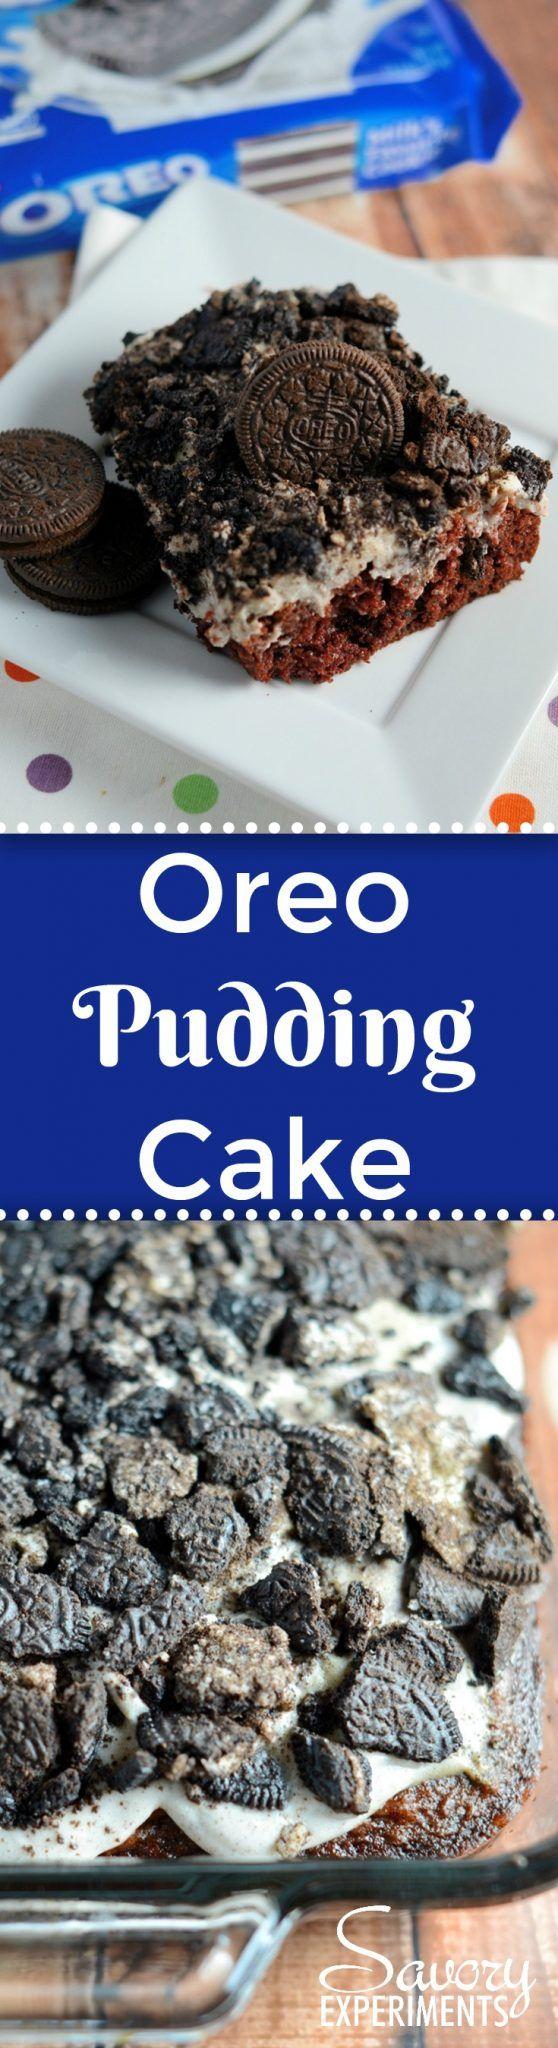 Oreo Pudding Cake is a poke recipe perfect for an easy party dessert. If you like Oreo balls, you'll love this easy cake recipe! #oreocookierecipes #oreopuddingcake #pokecakerecipes www.savoryexperiments.com via @savorycooking